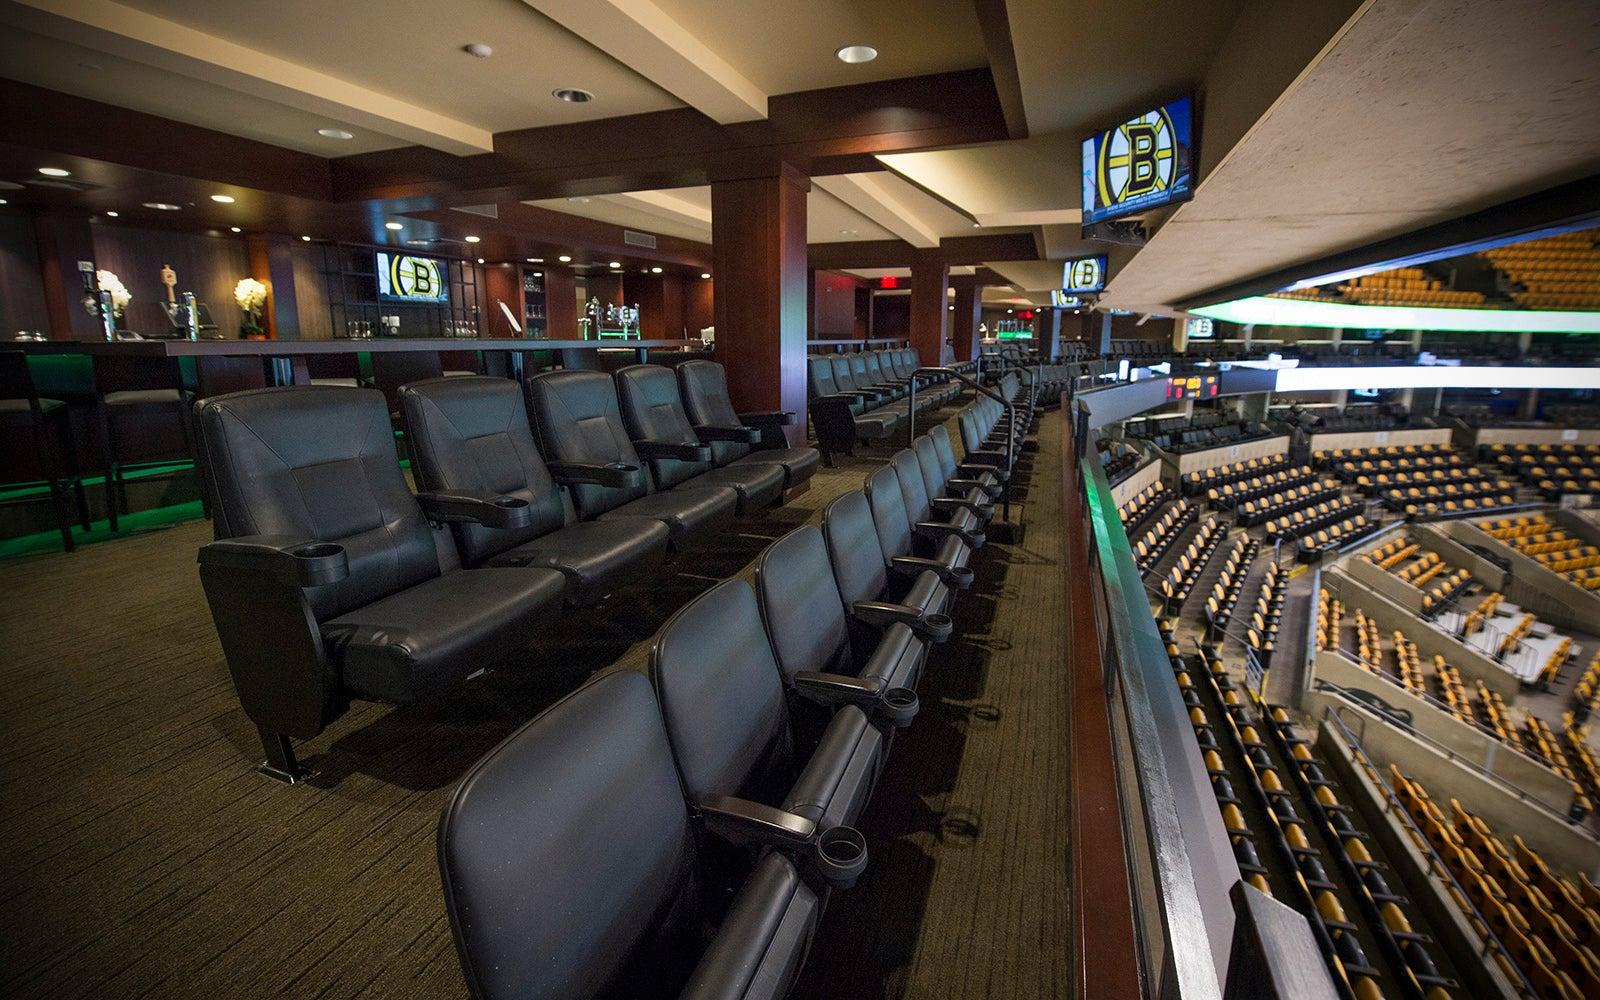 Image of Boardroom seats